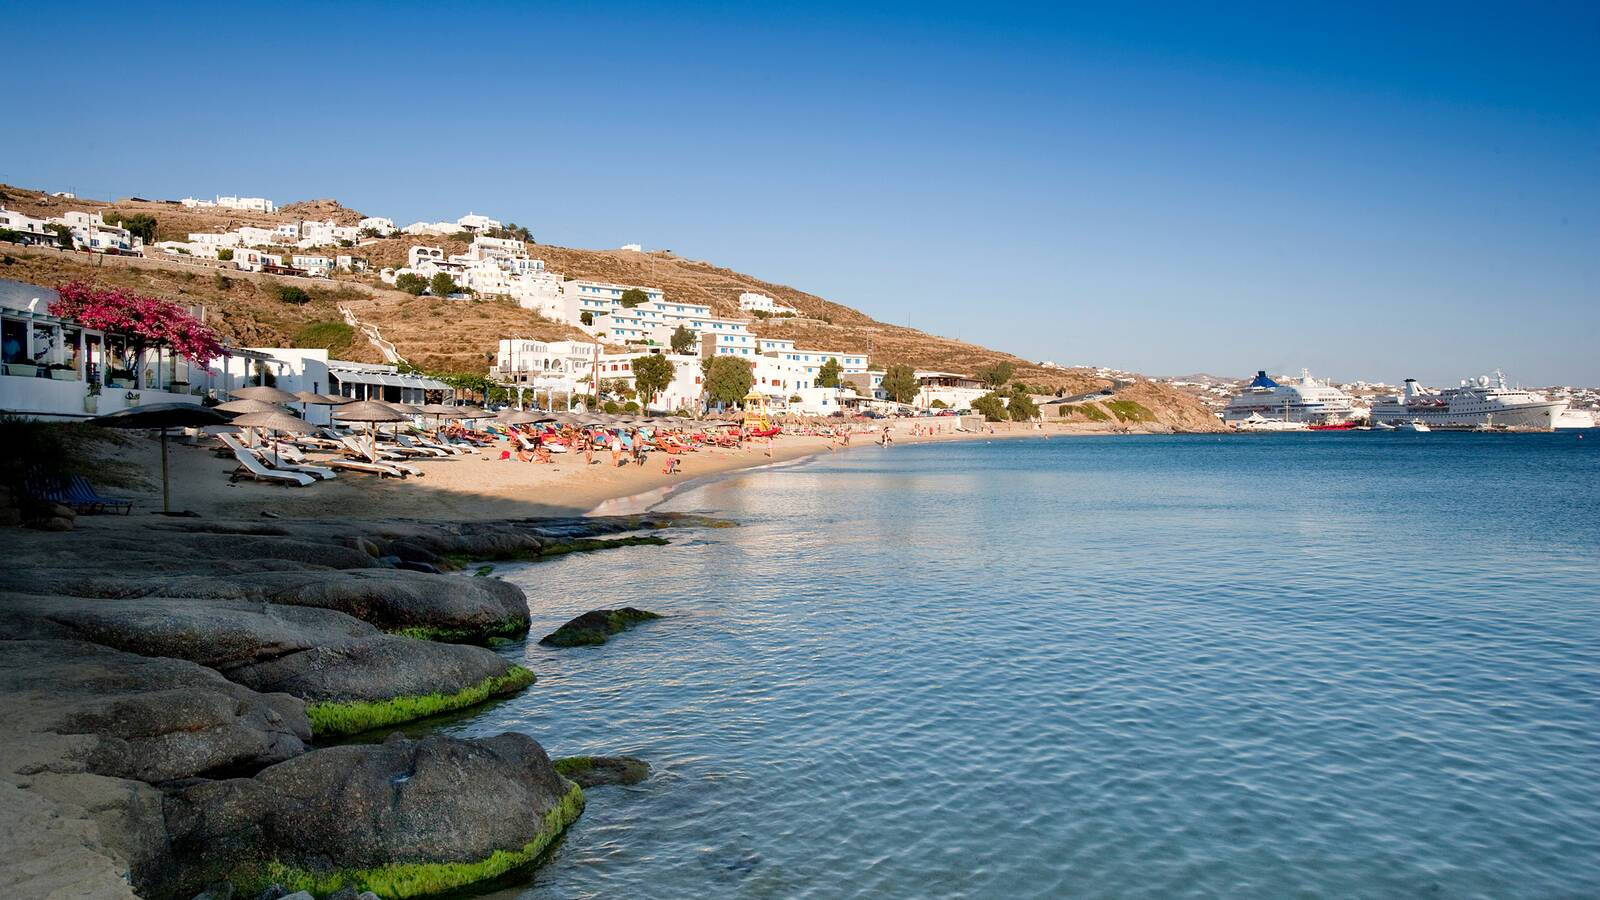 Grace Mykonos plage Agios Stefanos Mykonos